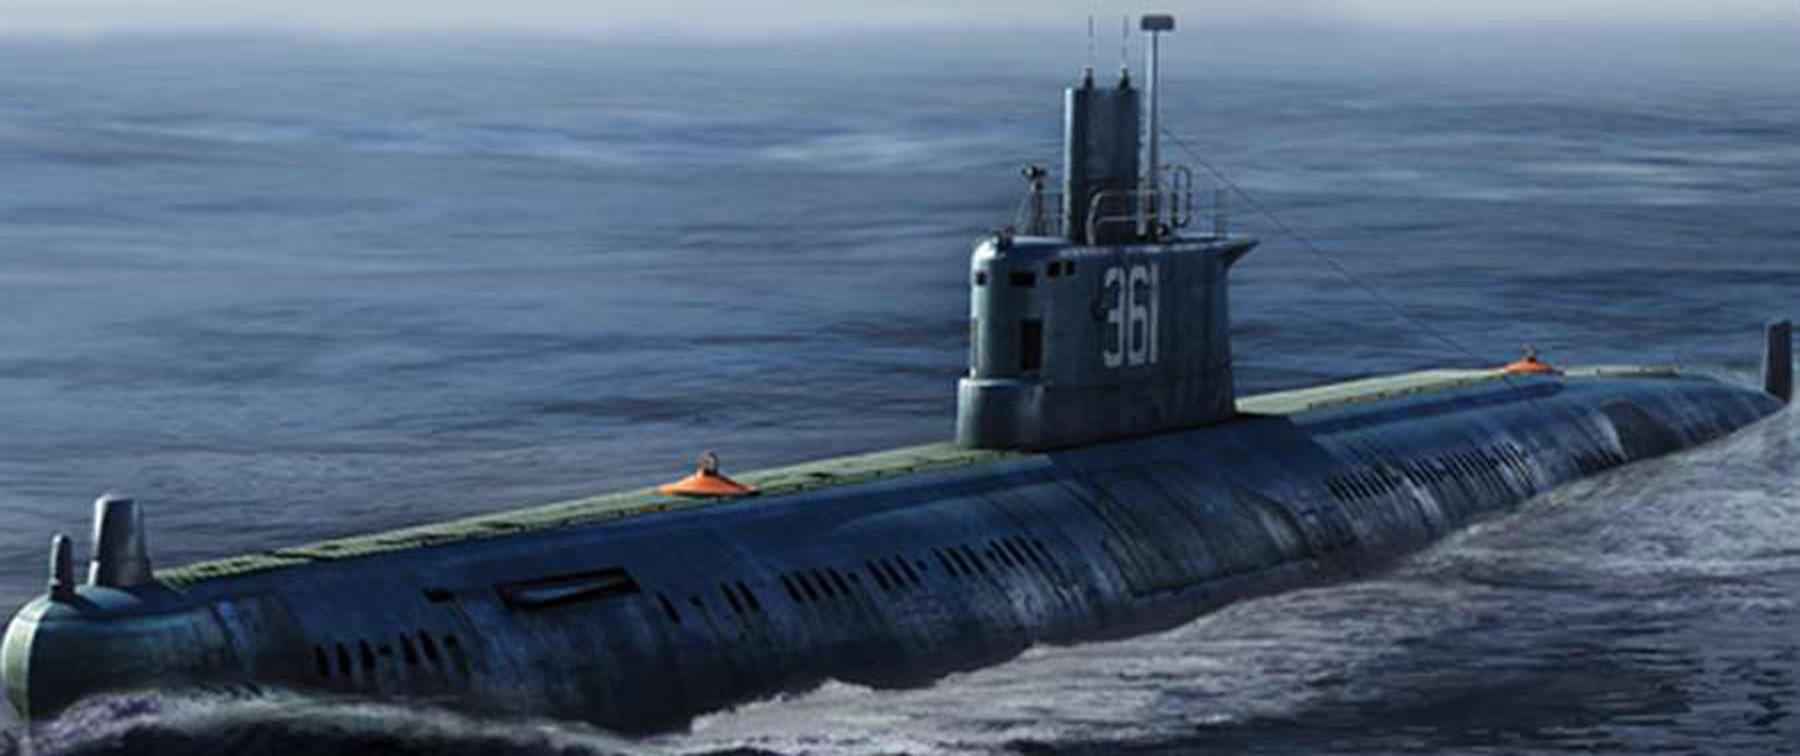 Type 035 (Ming class) submarines (1973)